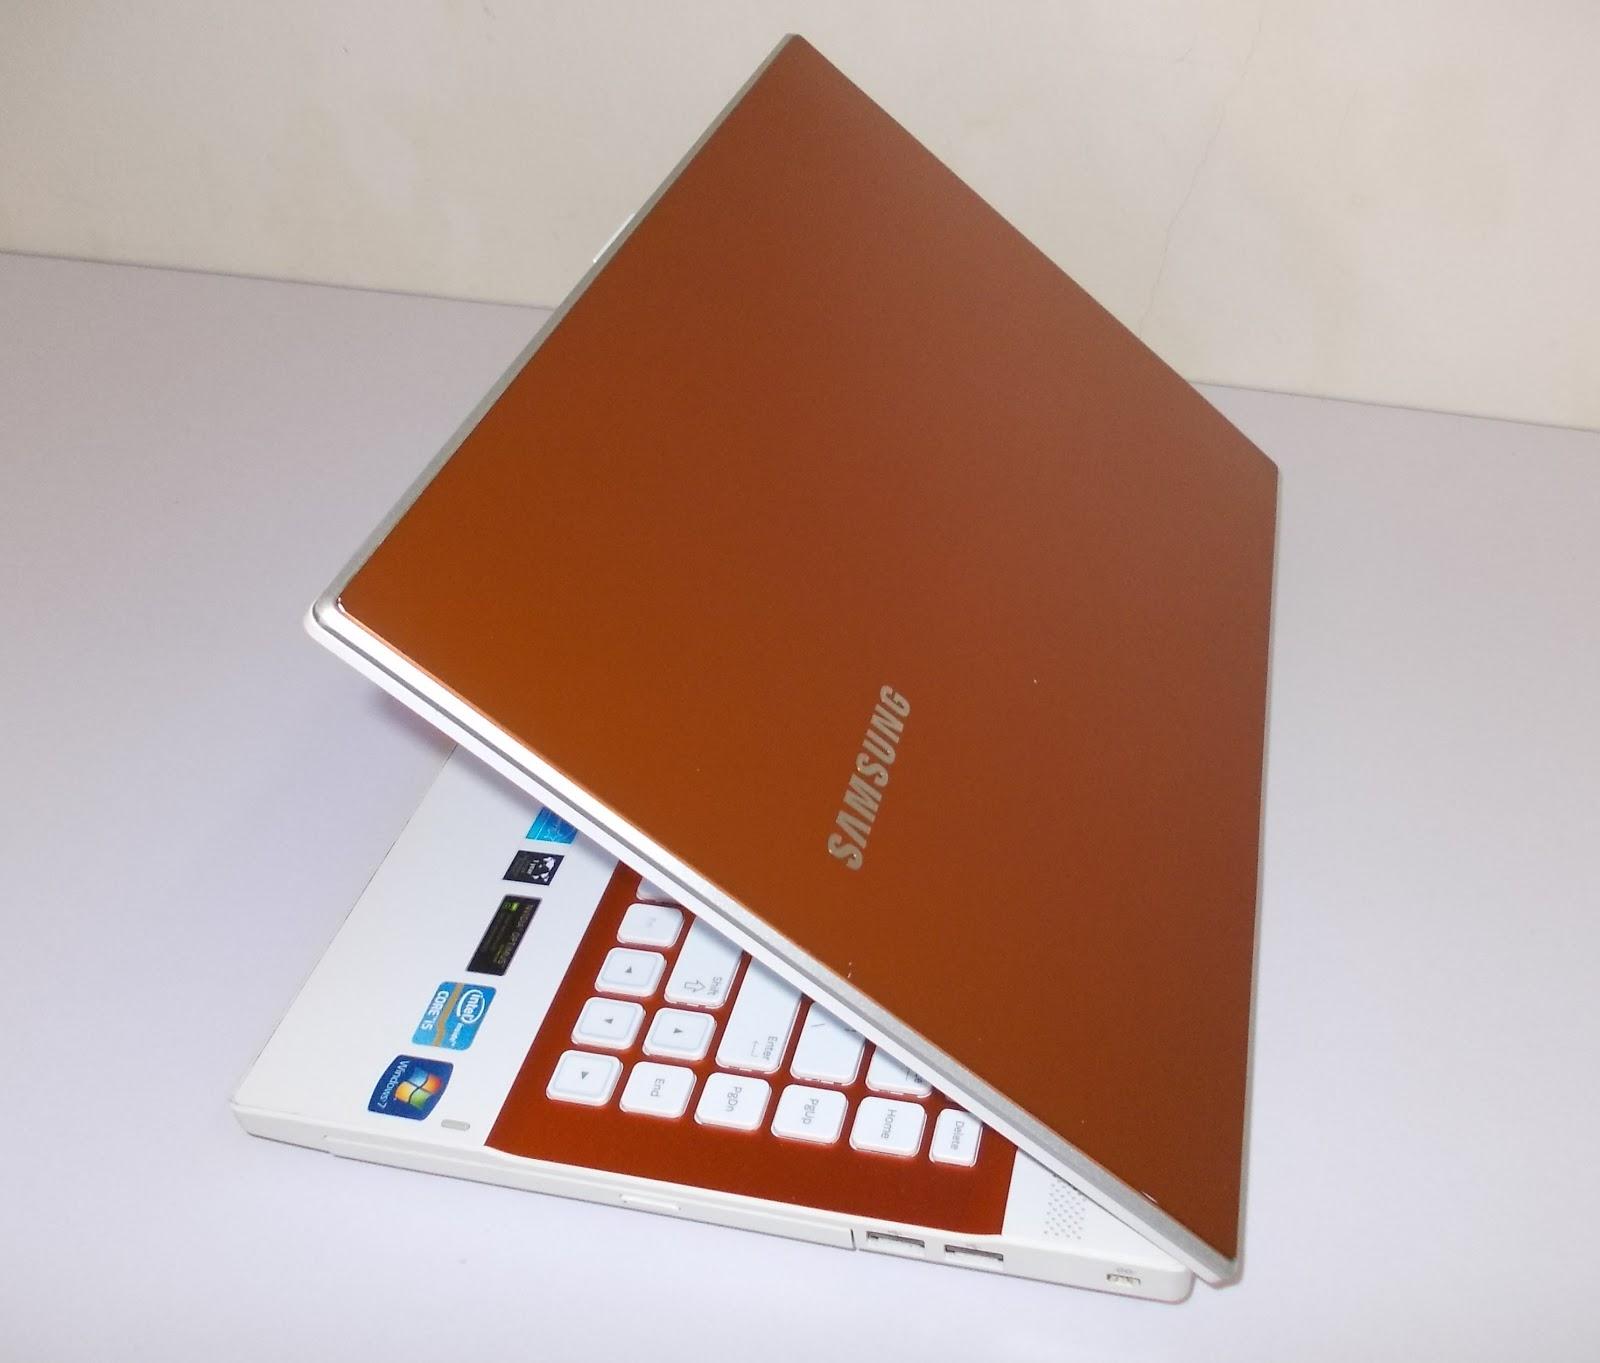 Used Laptop Samsung Np300 Series Core I5 6gb Ram 1gb Graphics Nvidia 98 Like New Rm 1285